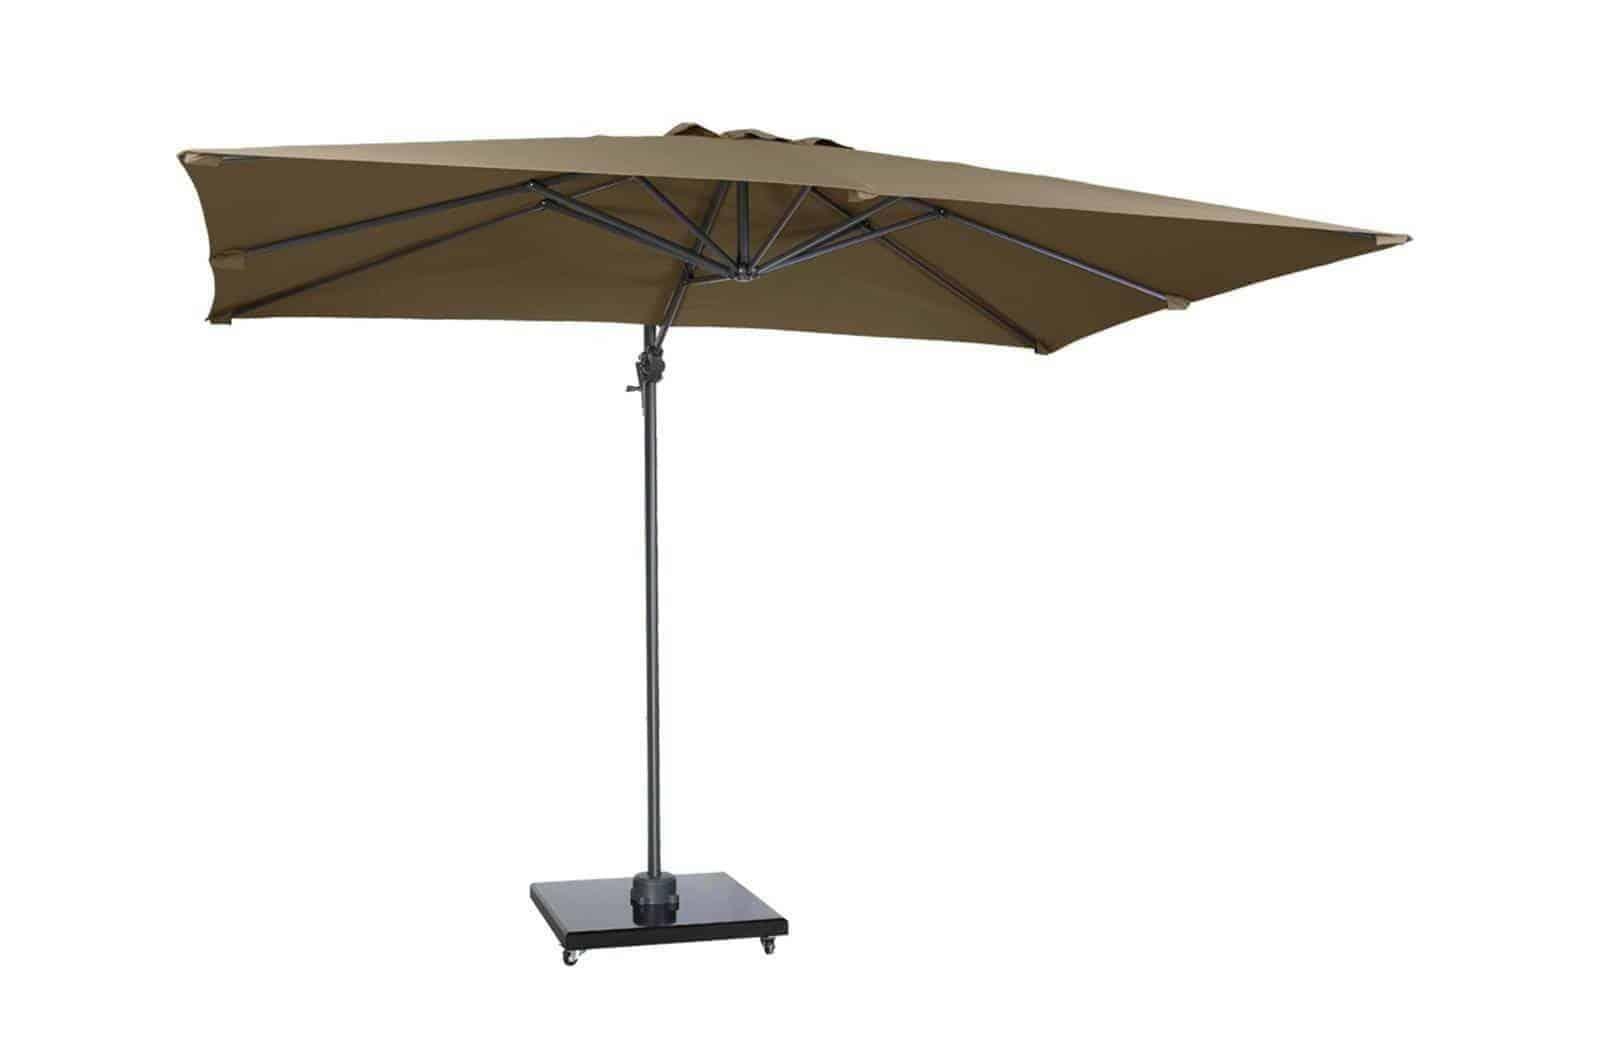 Parasol ogrodowy FALCON T1 3 m x 2 m taupe 7089E 575